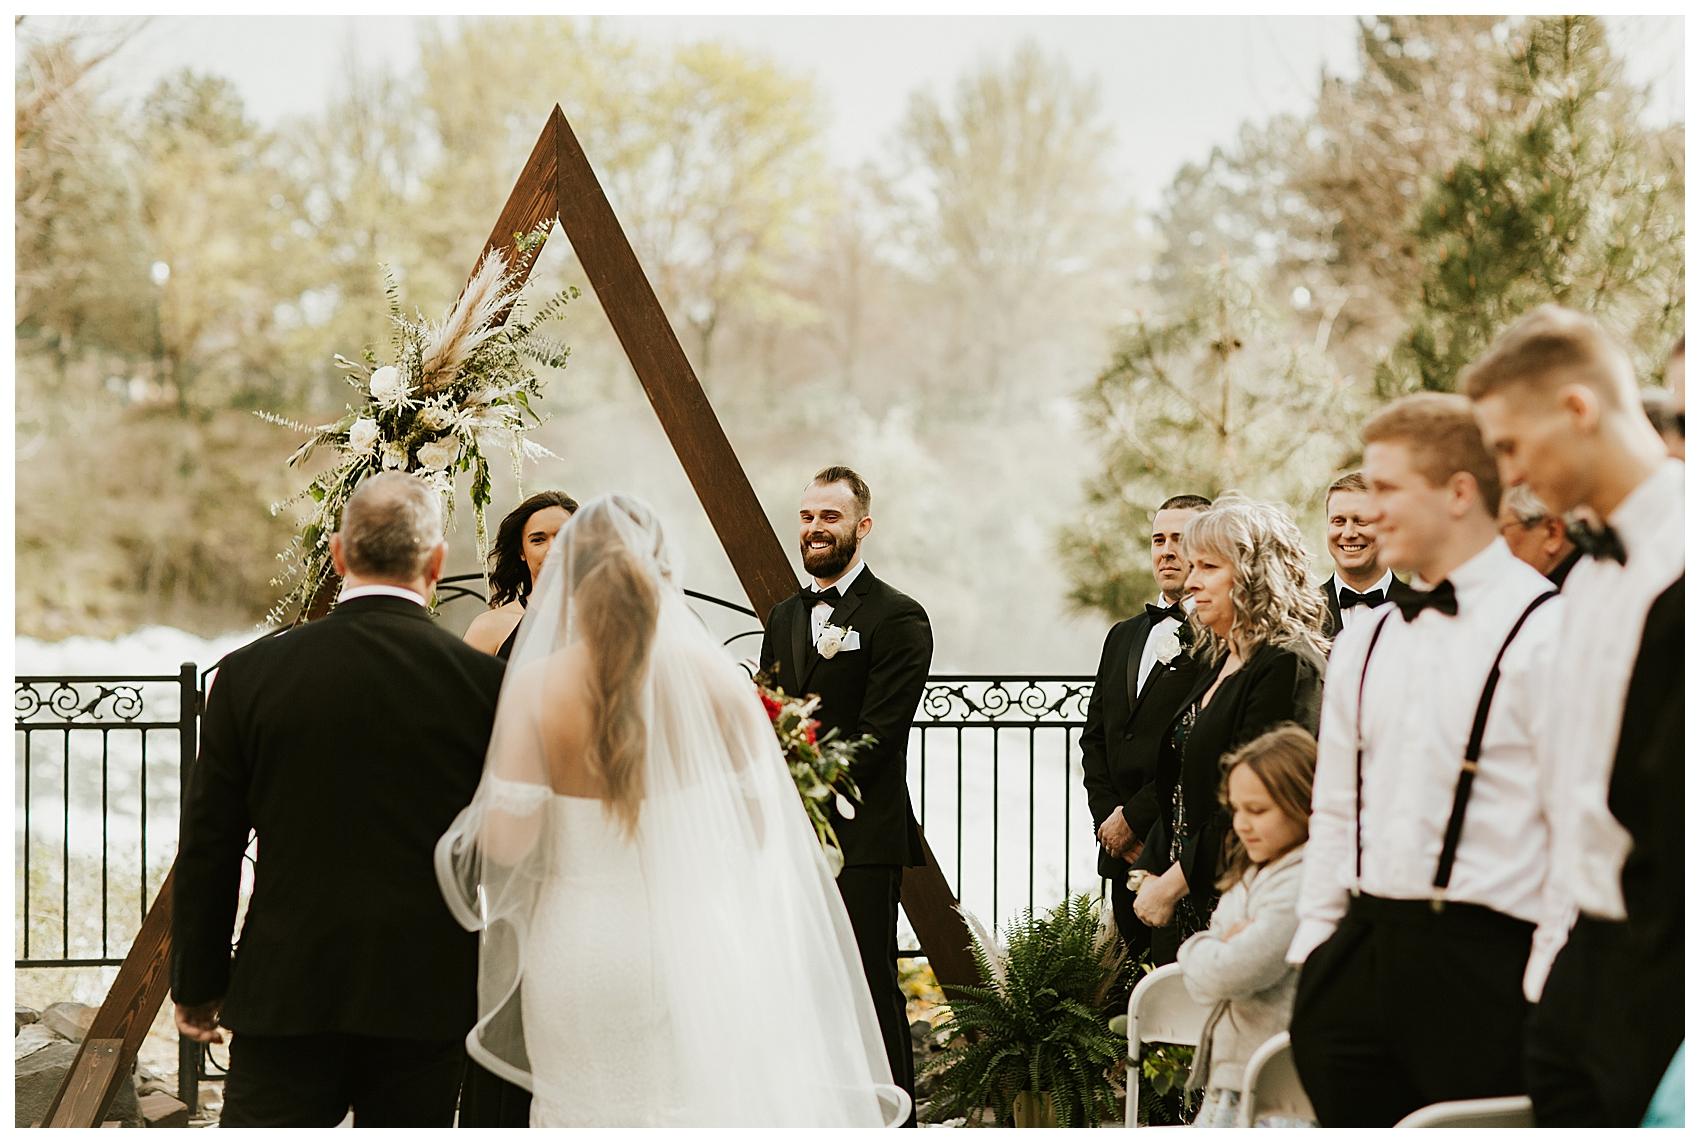 Chateau Rive Spokane Wedding Cassie Trottier Photography01051.jpg